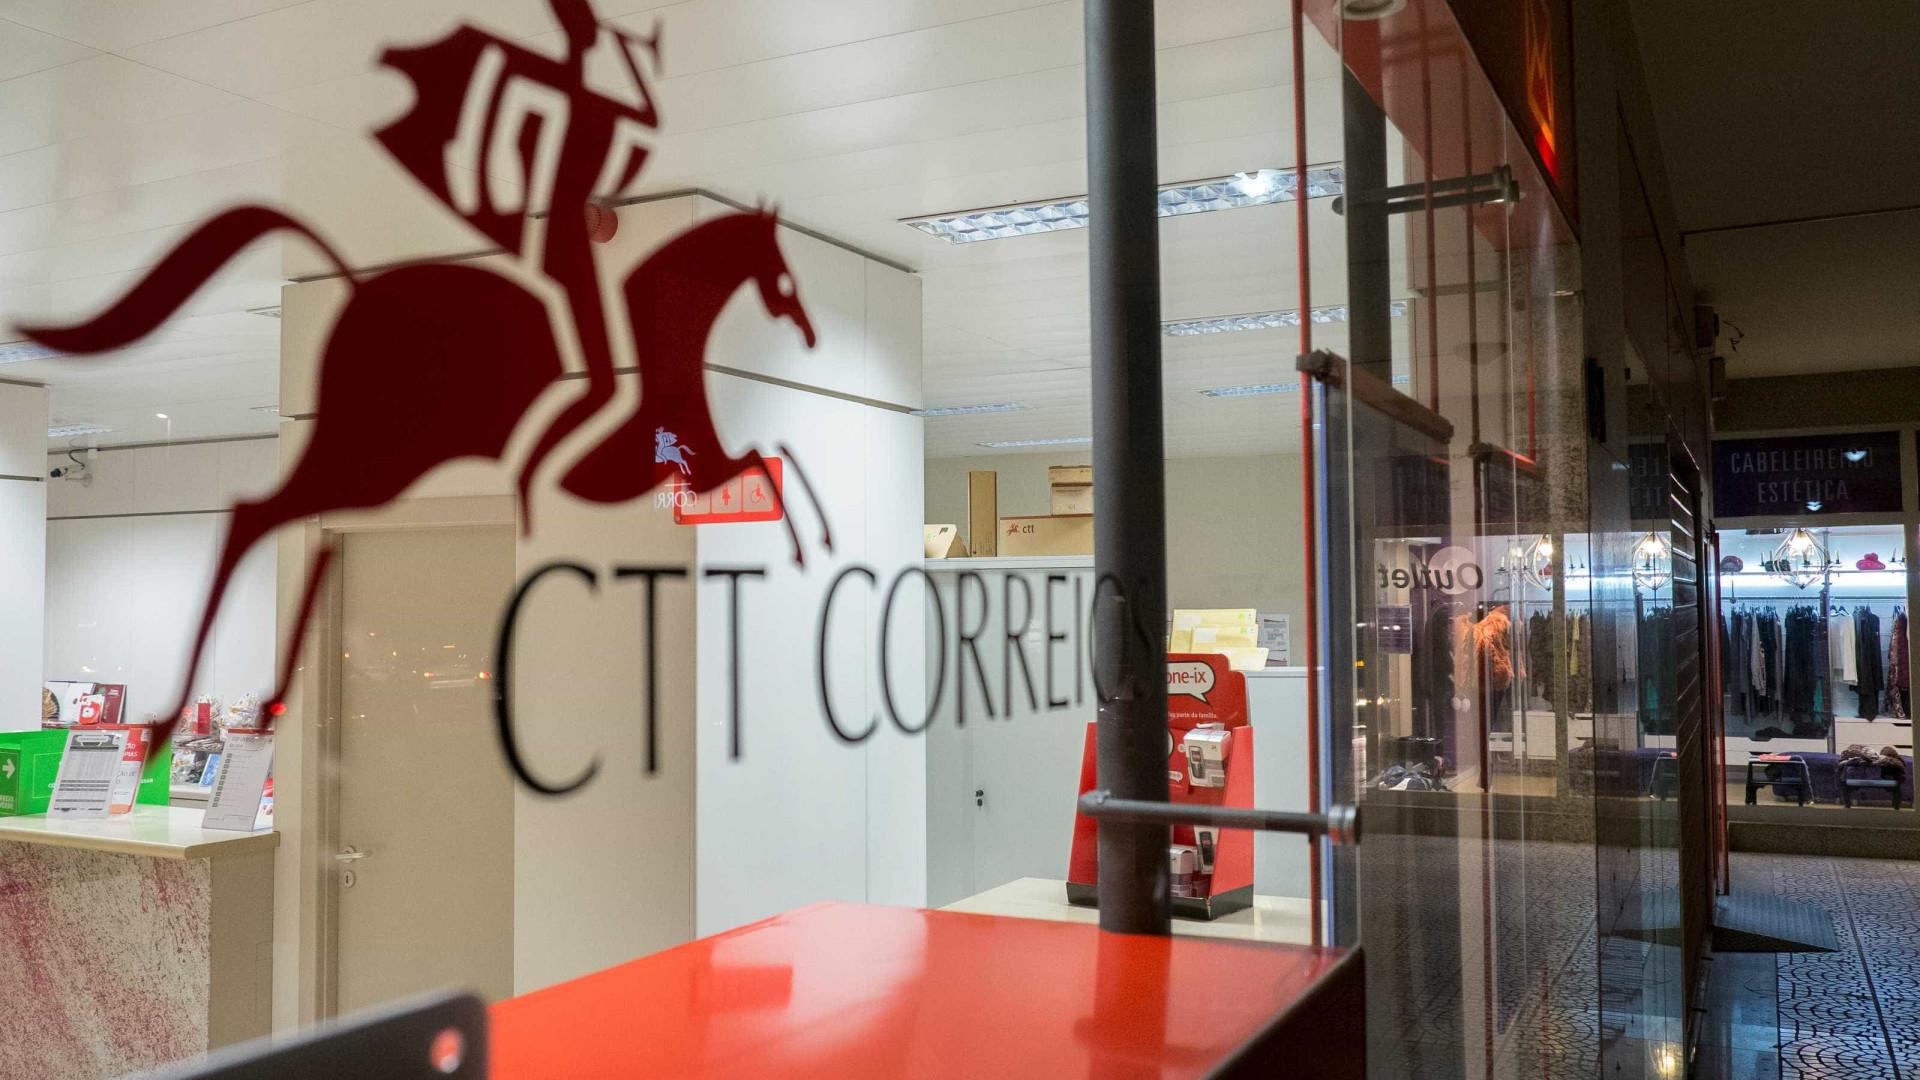 Banco CTT convence portugueses: Em nove meses, angariou 100 mil clientes